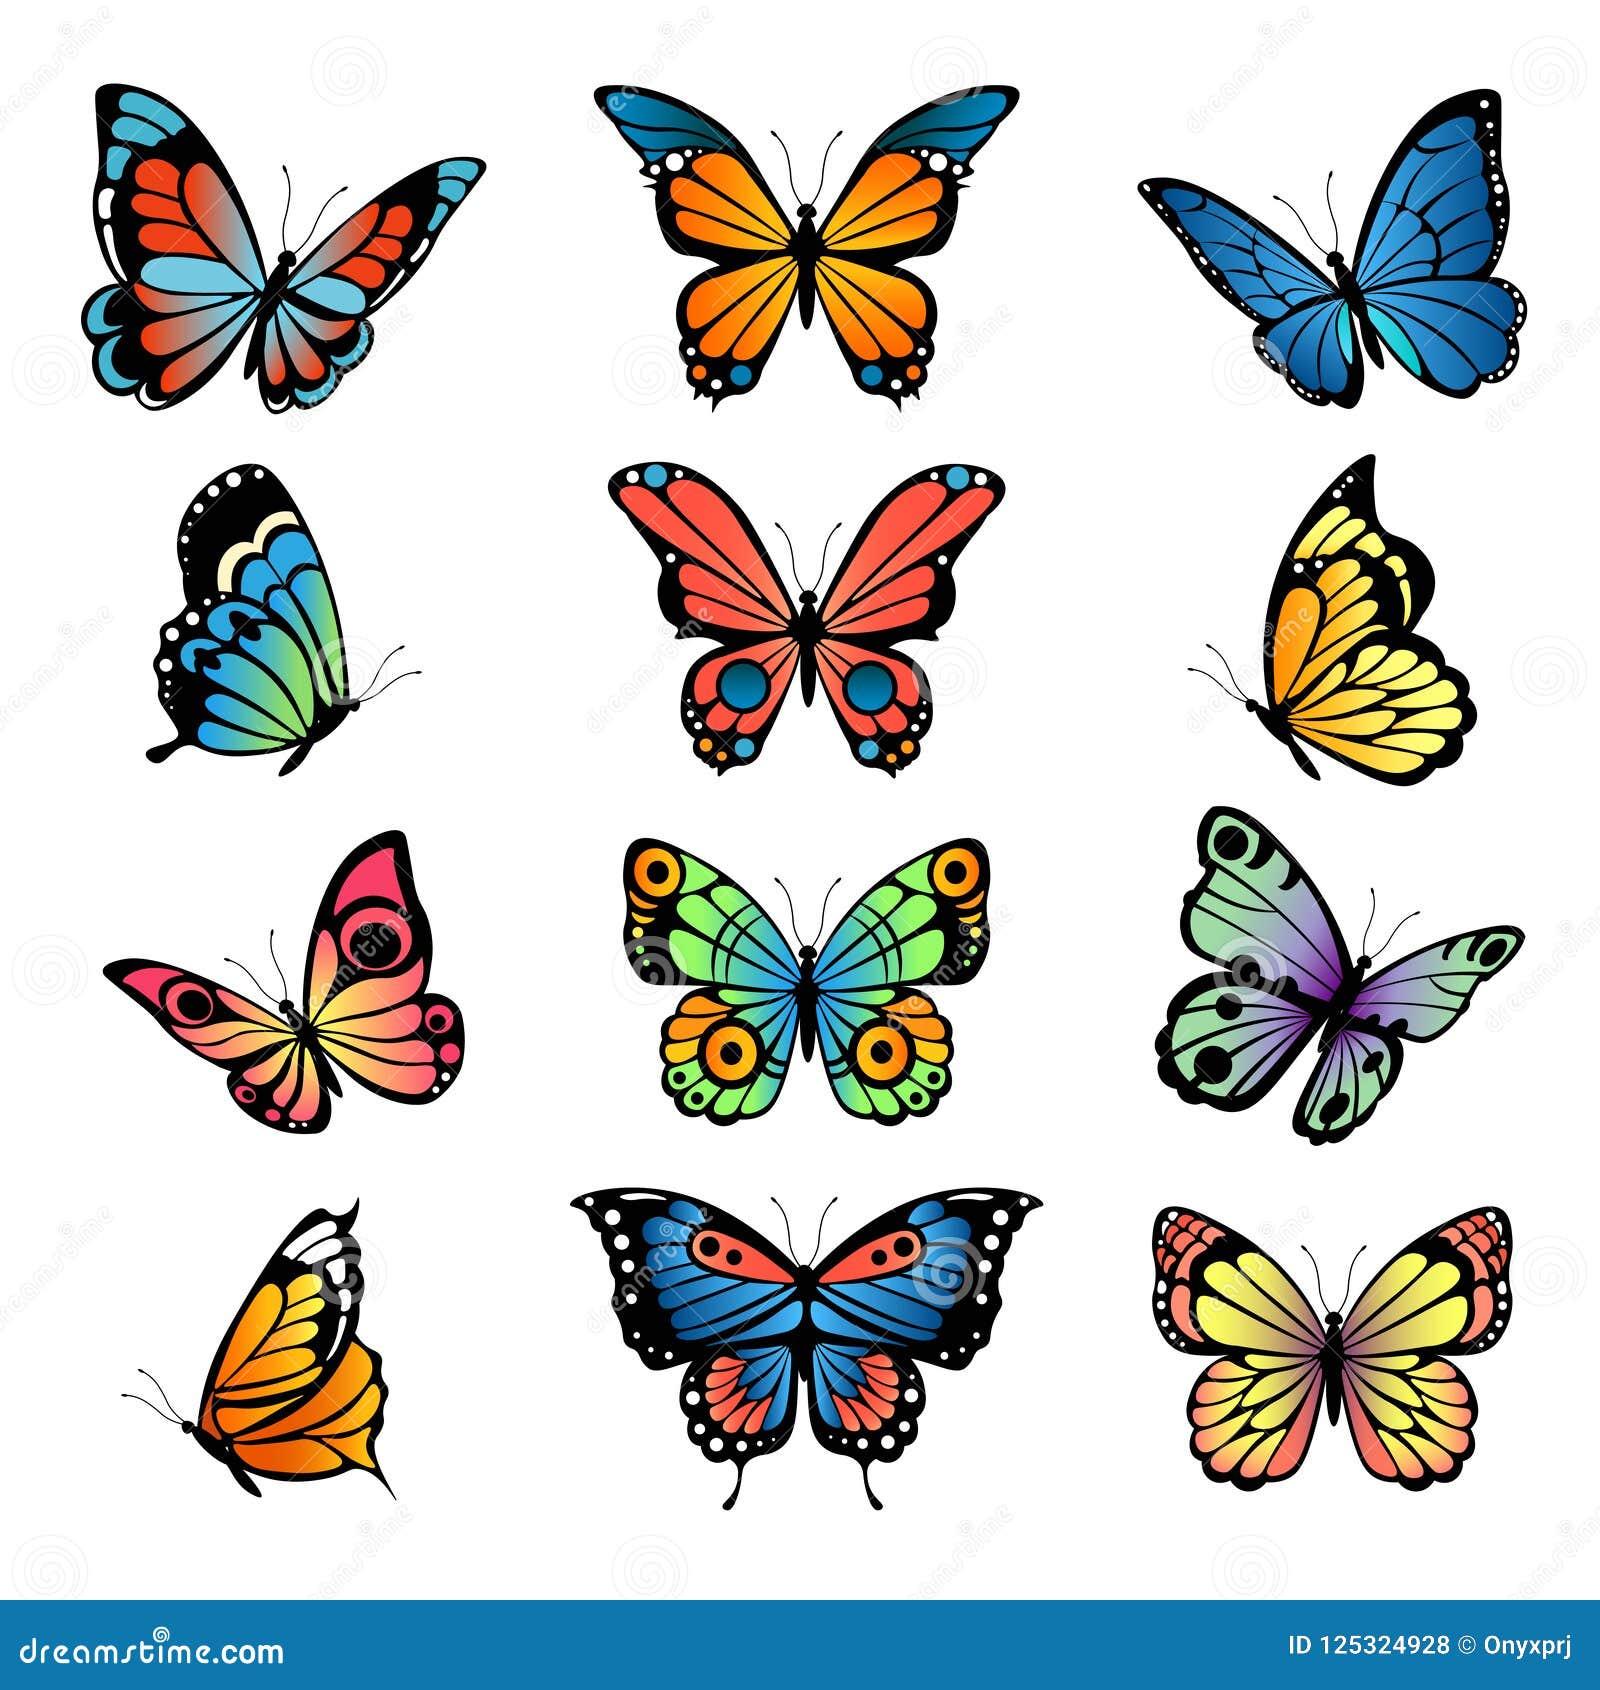 Różnorodni kreskówka motyle Ustawia wektorowe ilustracje motyle